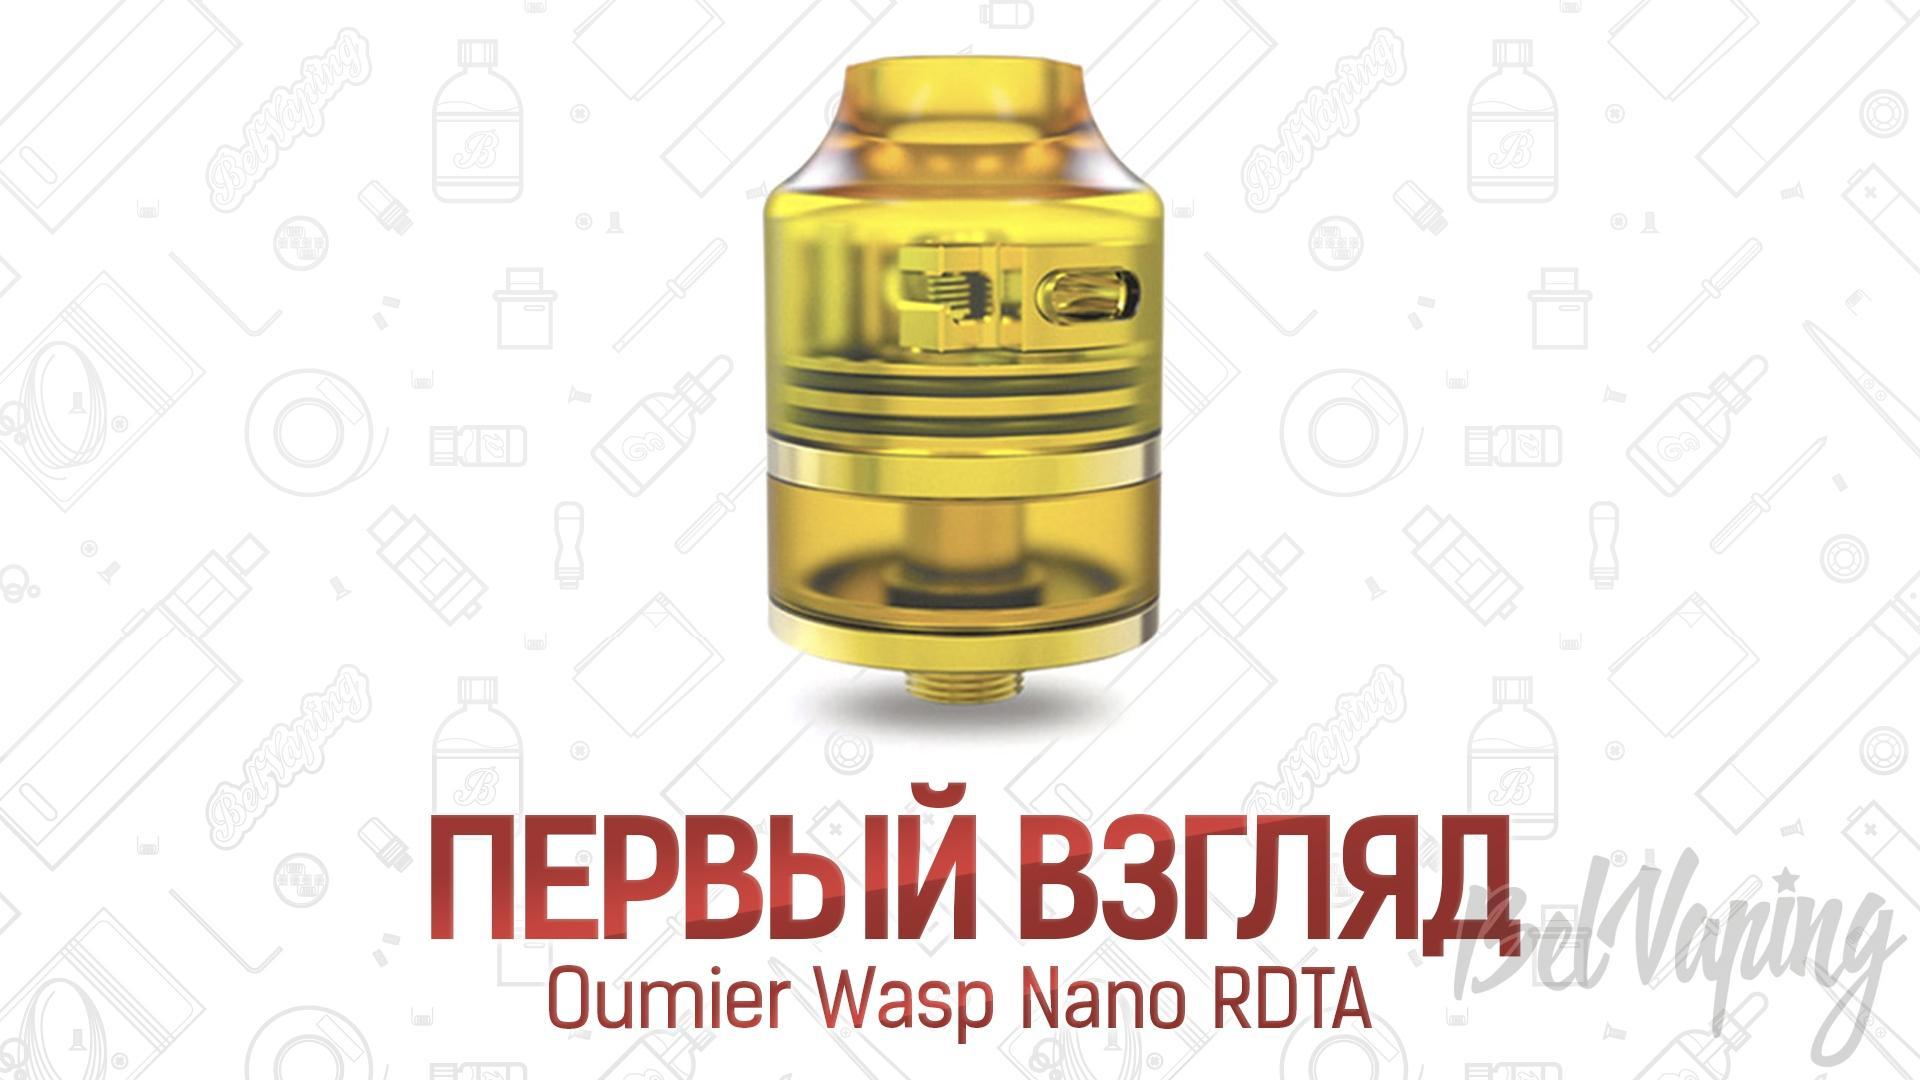 Oumier Wasp Nano RDTA. Первый взгляд